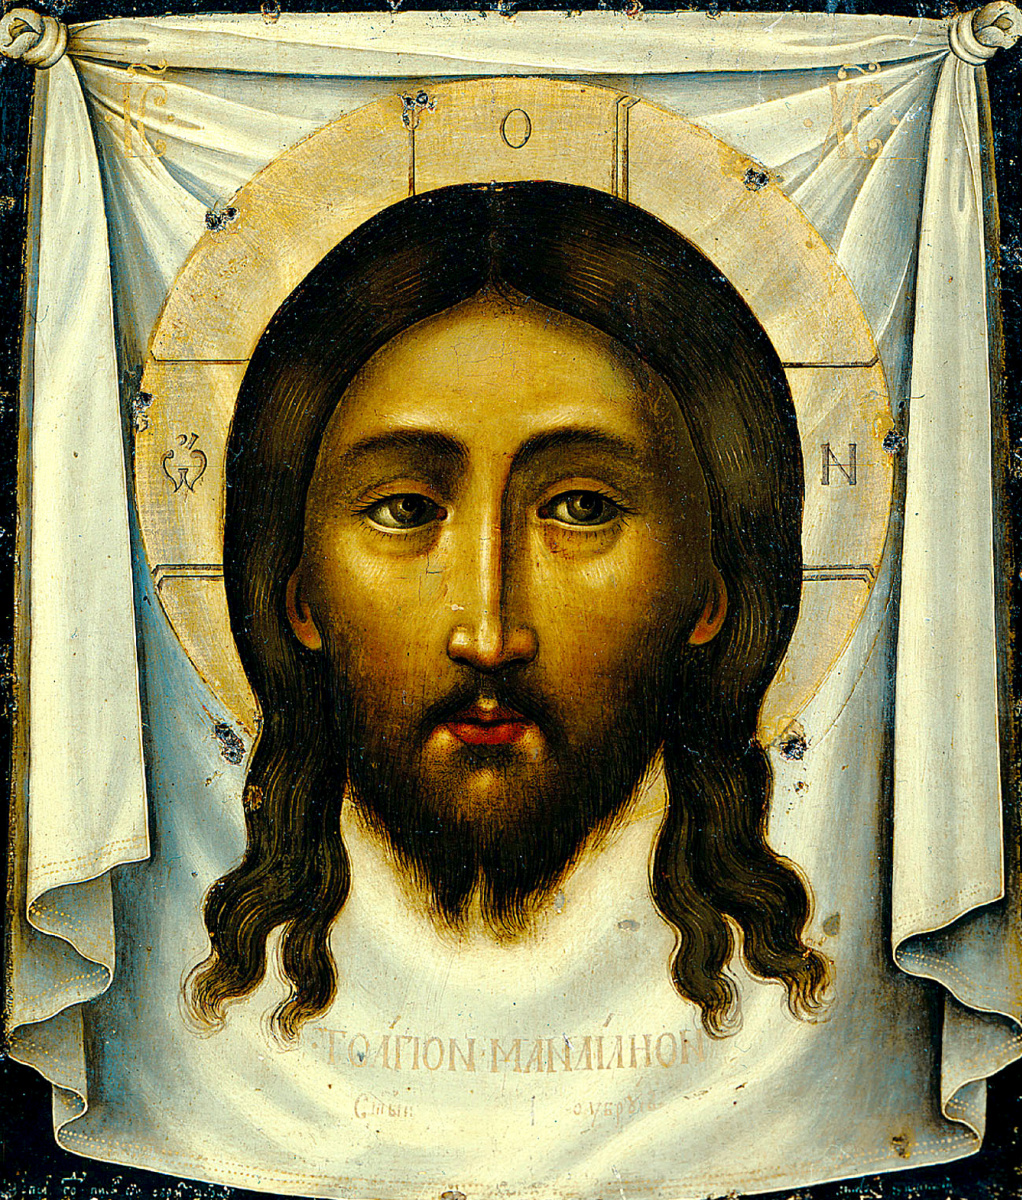 Simon Ushakov. Savior not man-made.